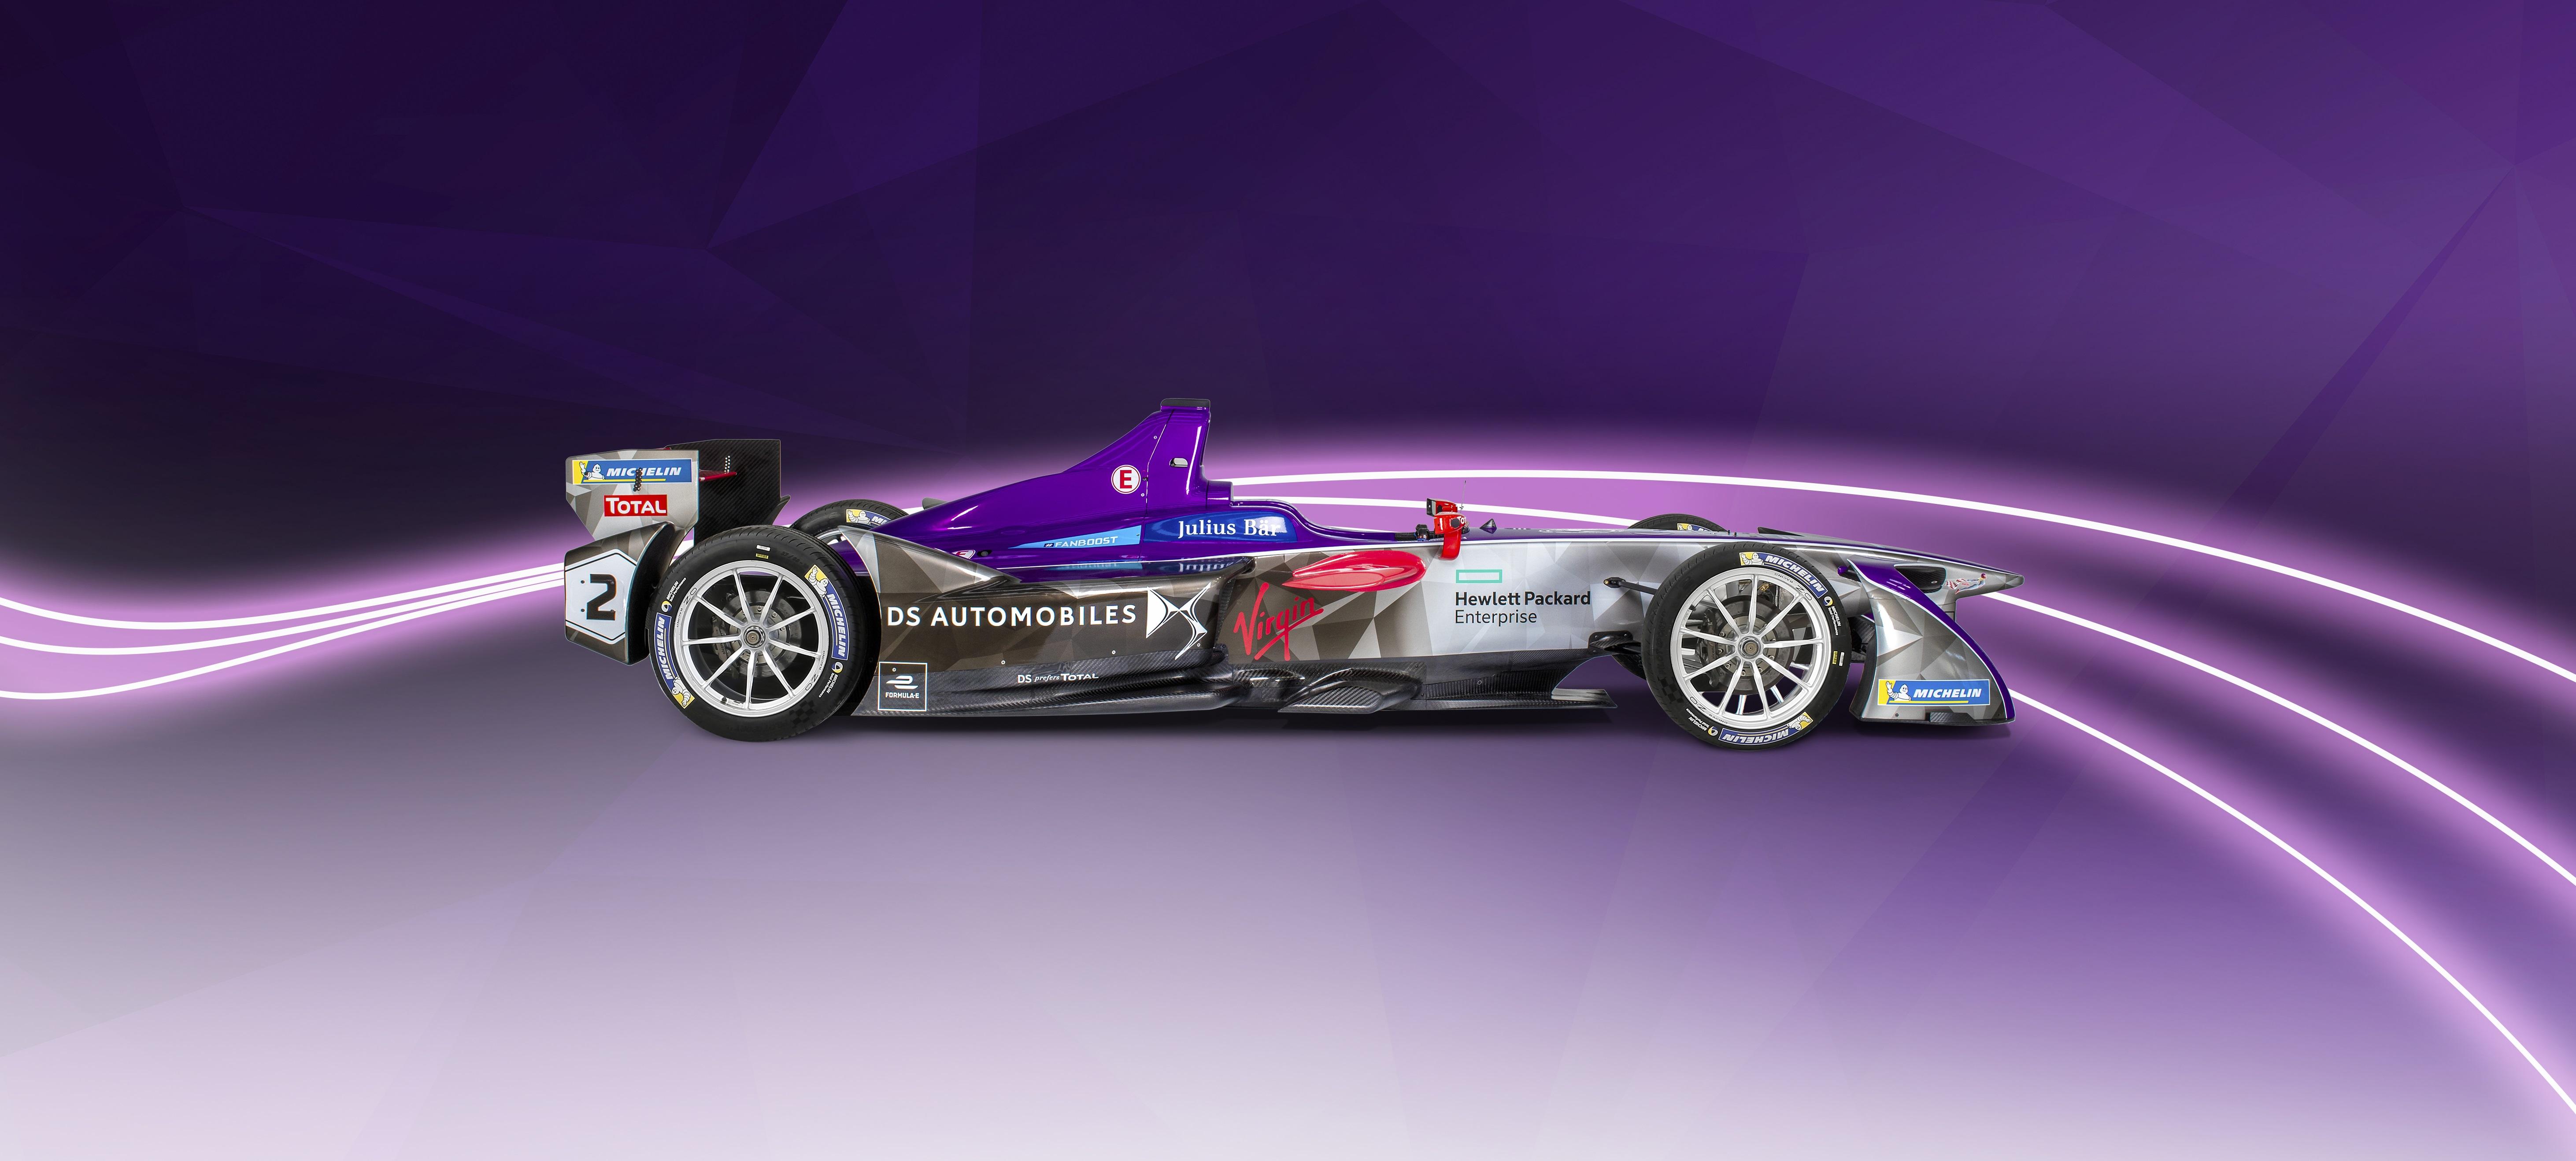 DS Virgin_Racing_DSV_03_Formula_E